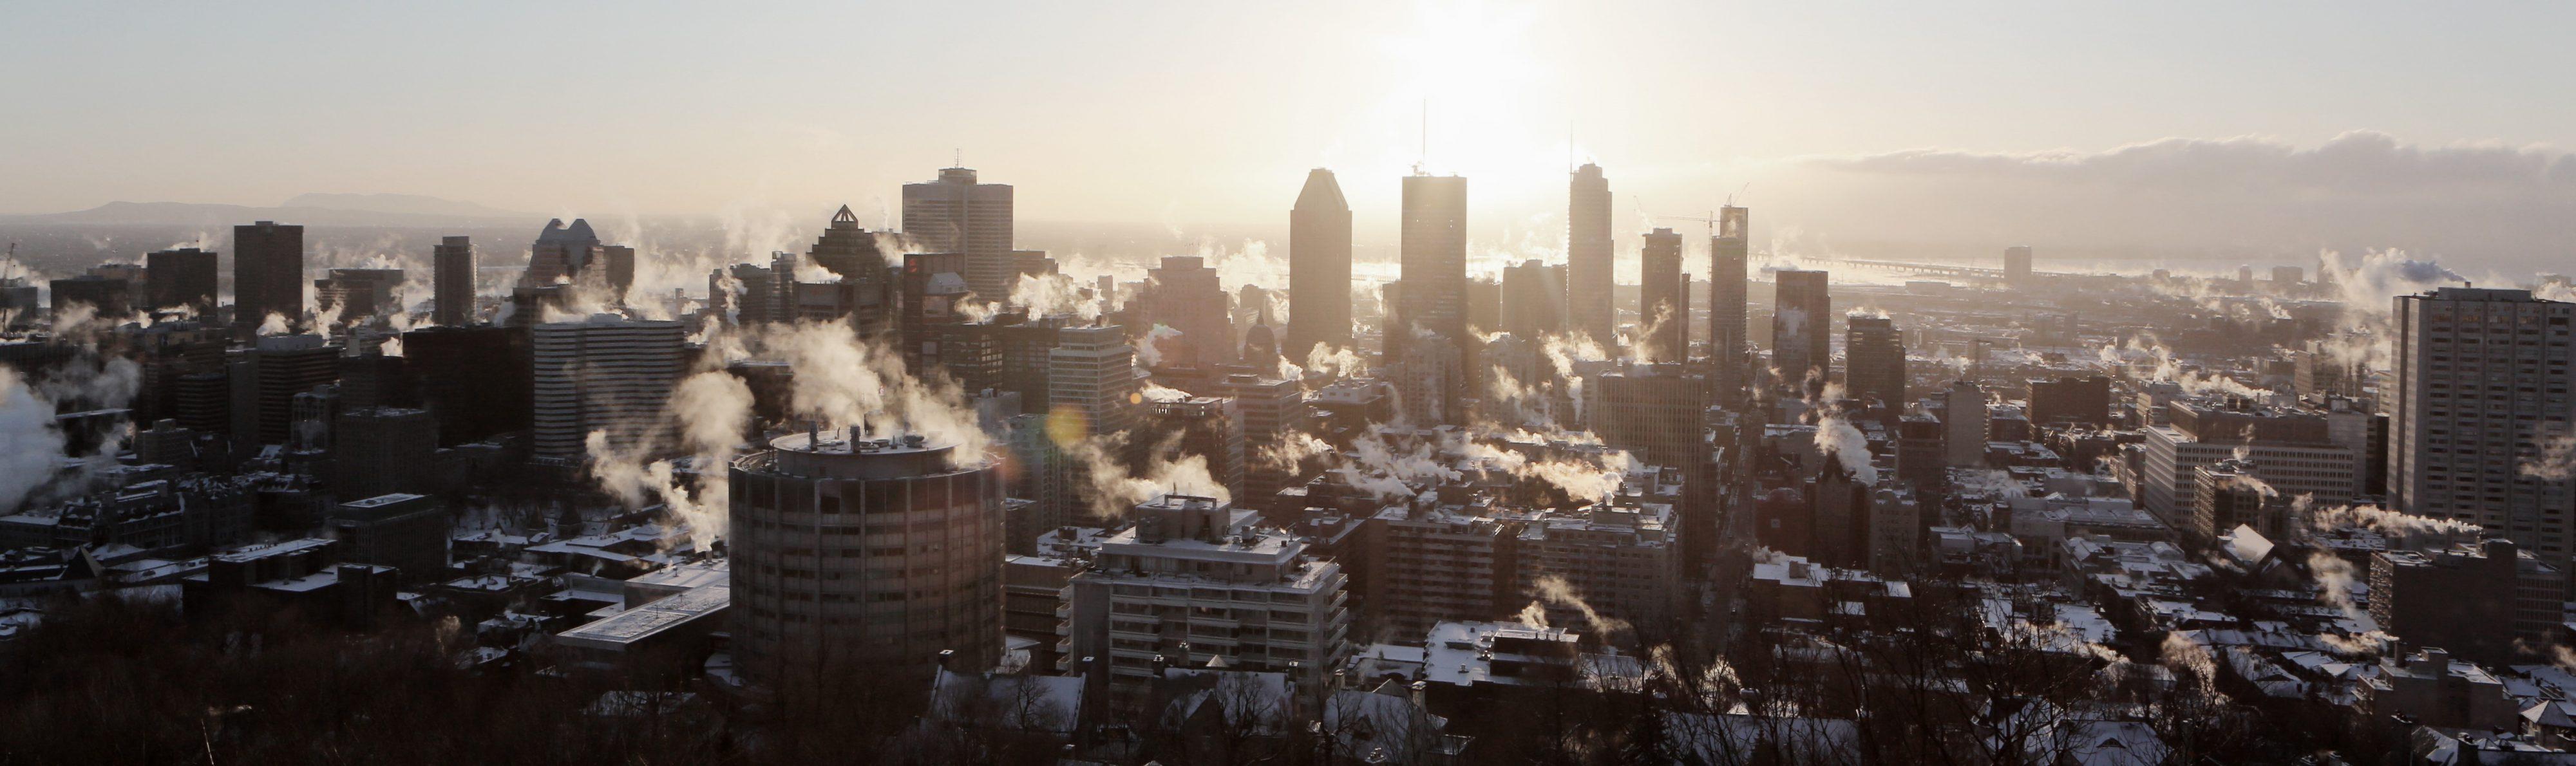 Life-of-Pix-free-stock-city-sky-sunset-LEEROY